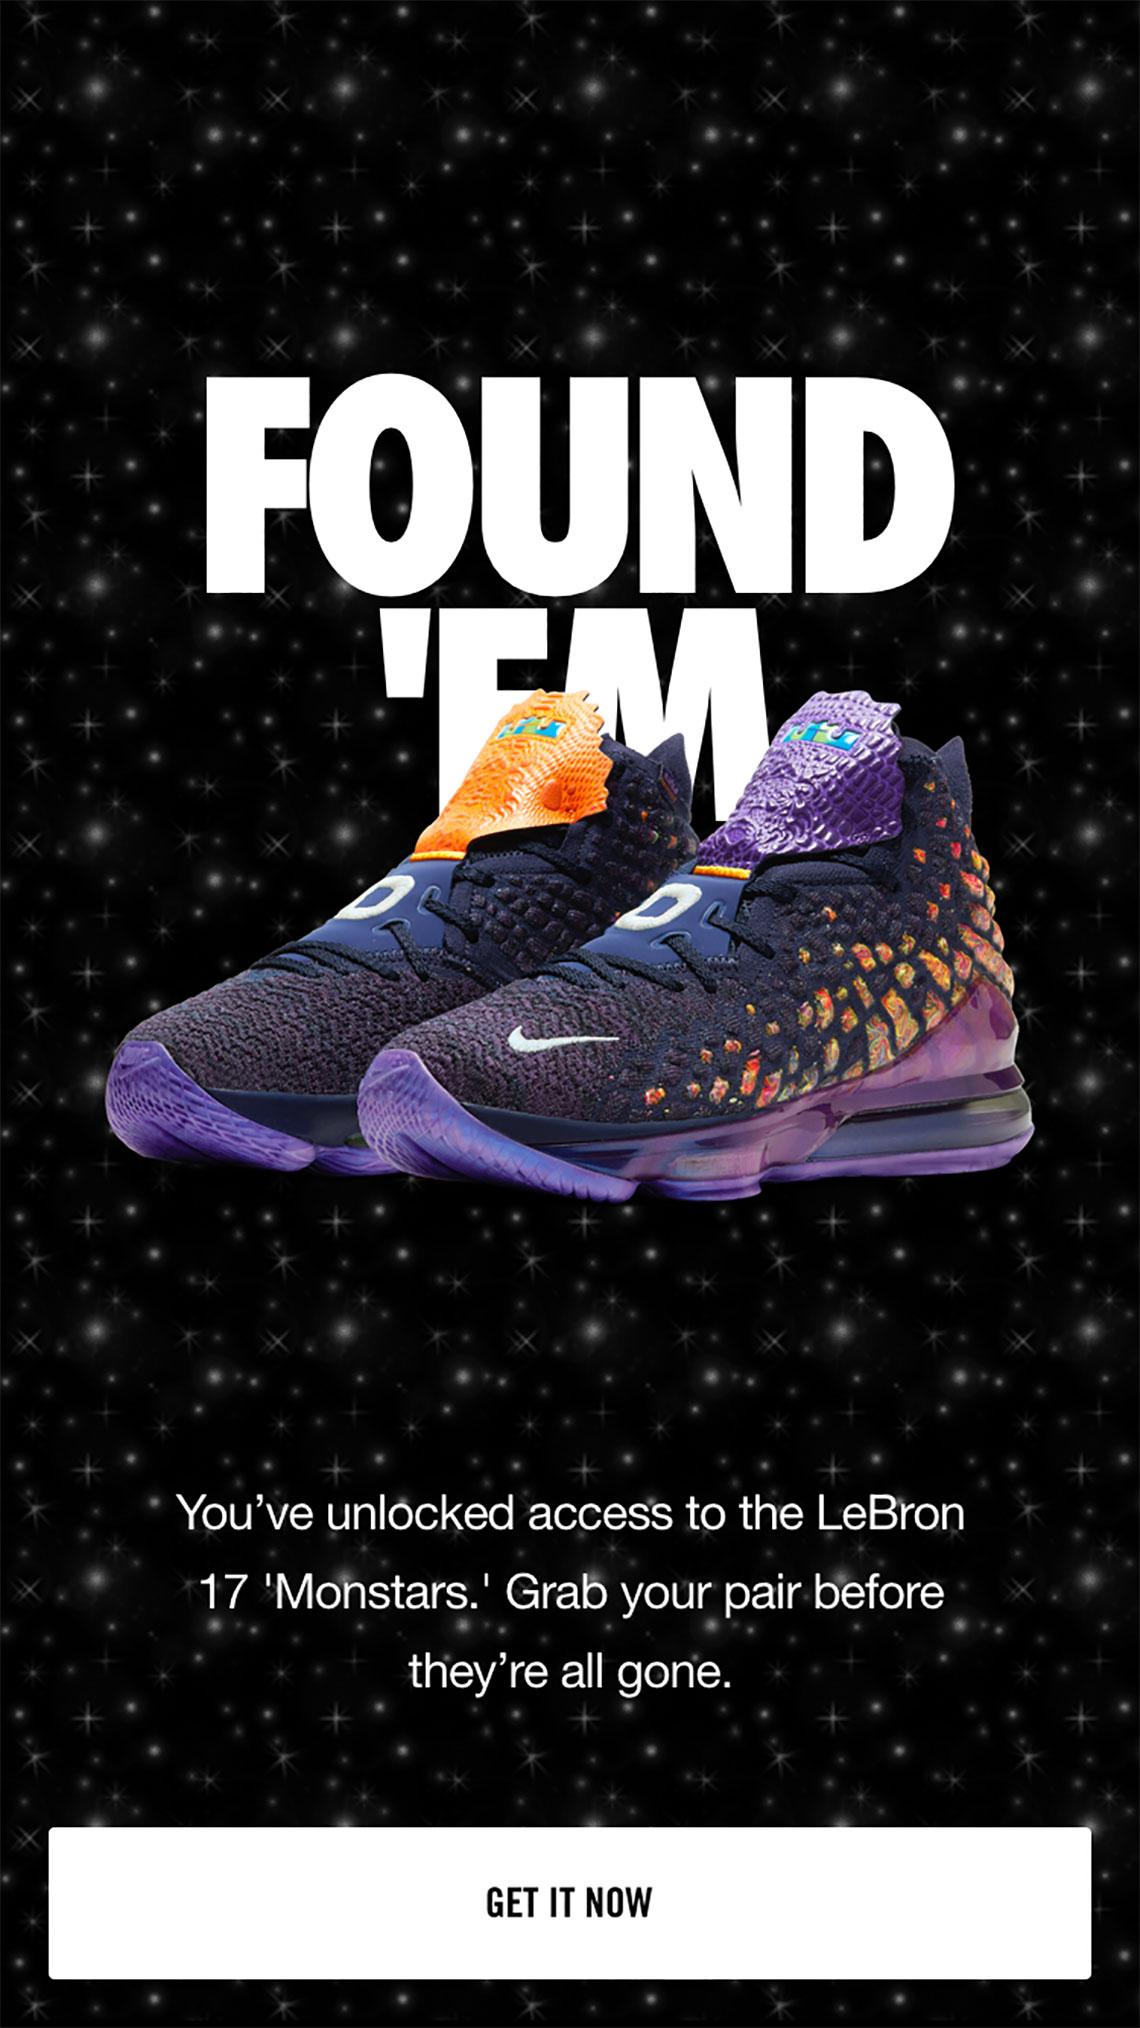 ecuación bestia Hermana  Nike LeBron 17 Monstars CD5050-400 Release Date | SneakerNews.com